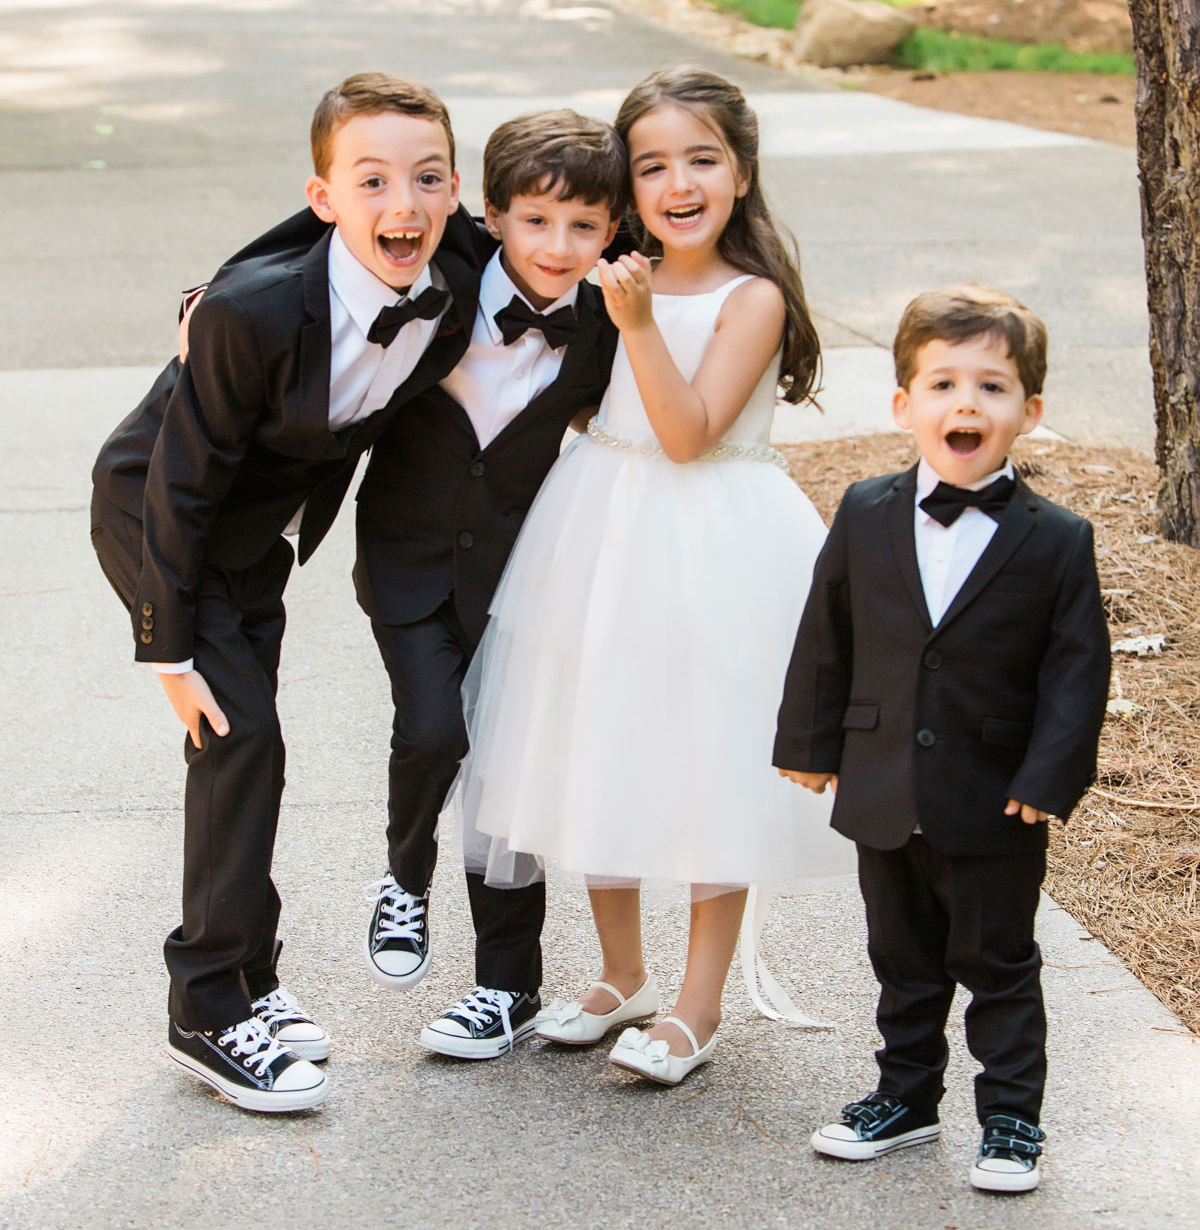 476e93e57 What Should Your Flower Girl and Ring Bearer Wear? - Inside Weddings